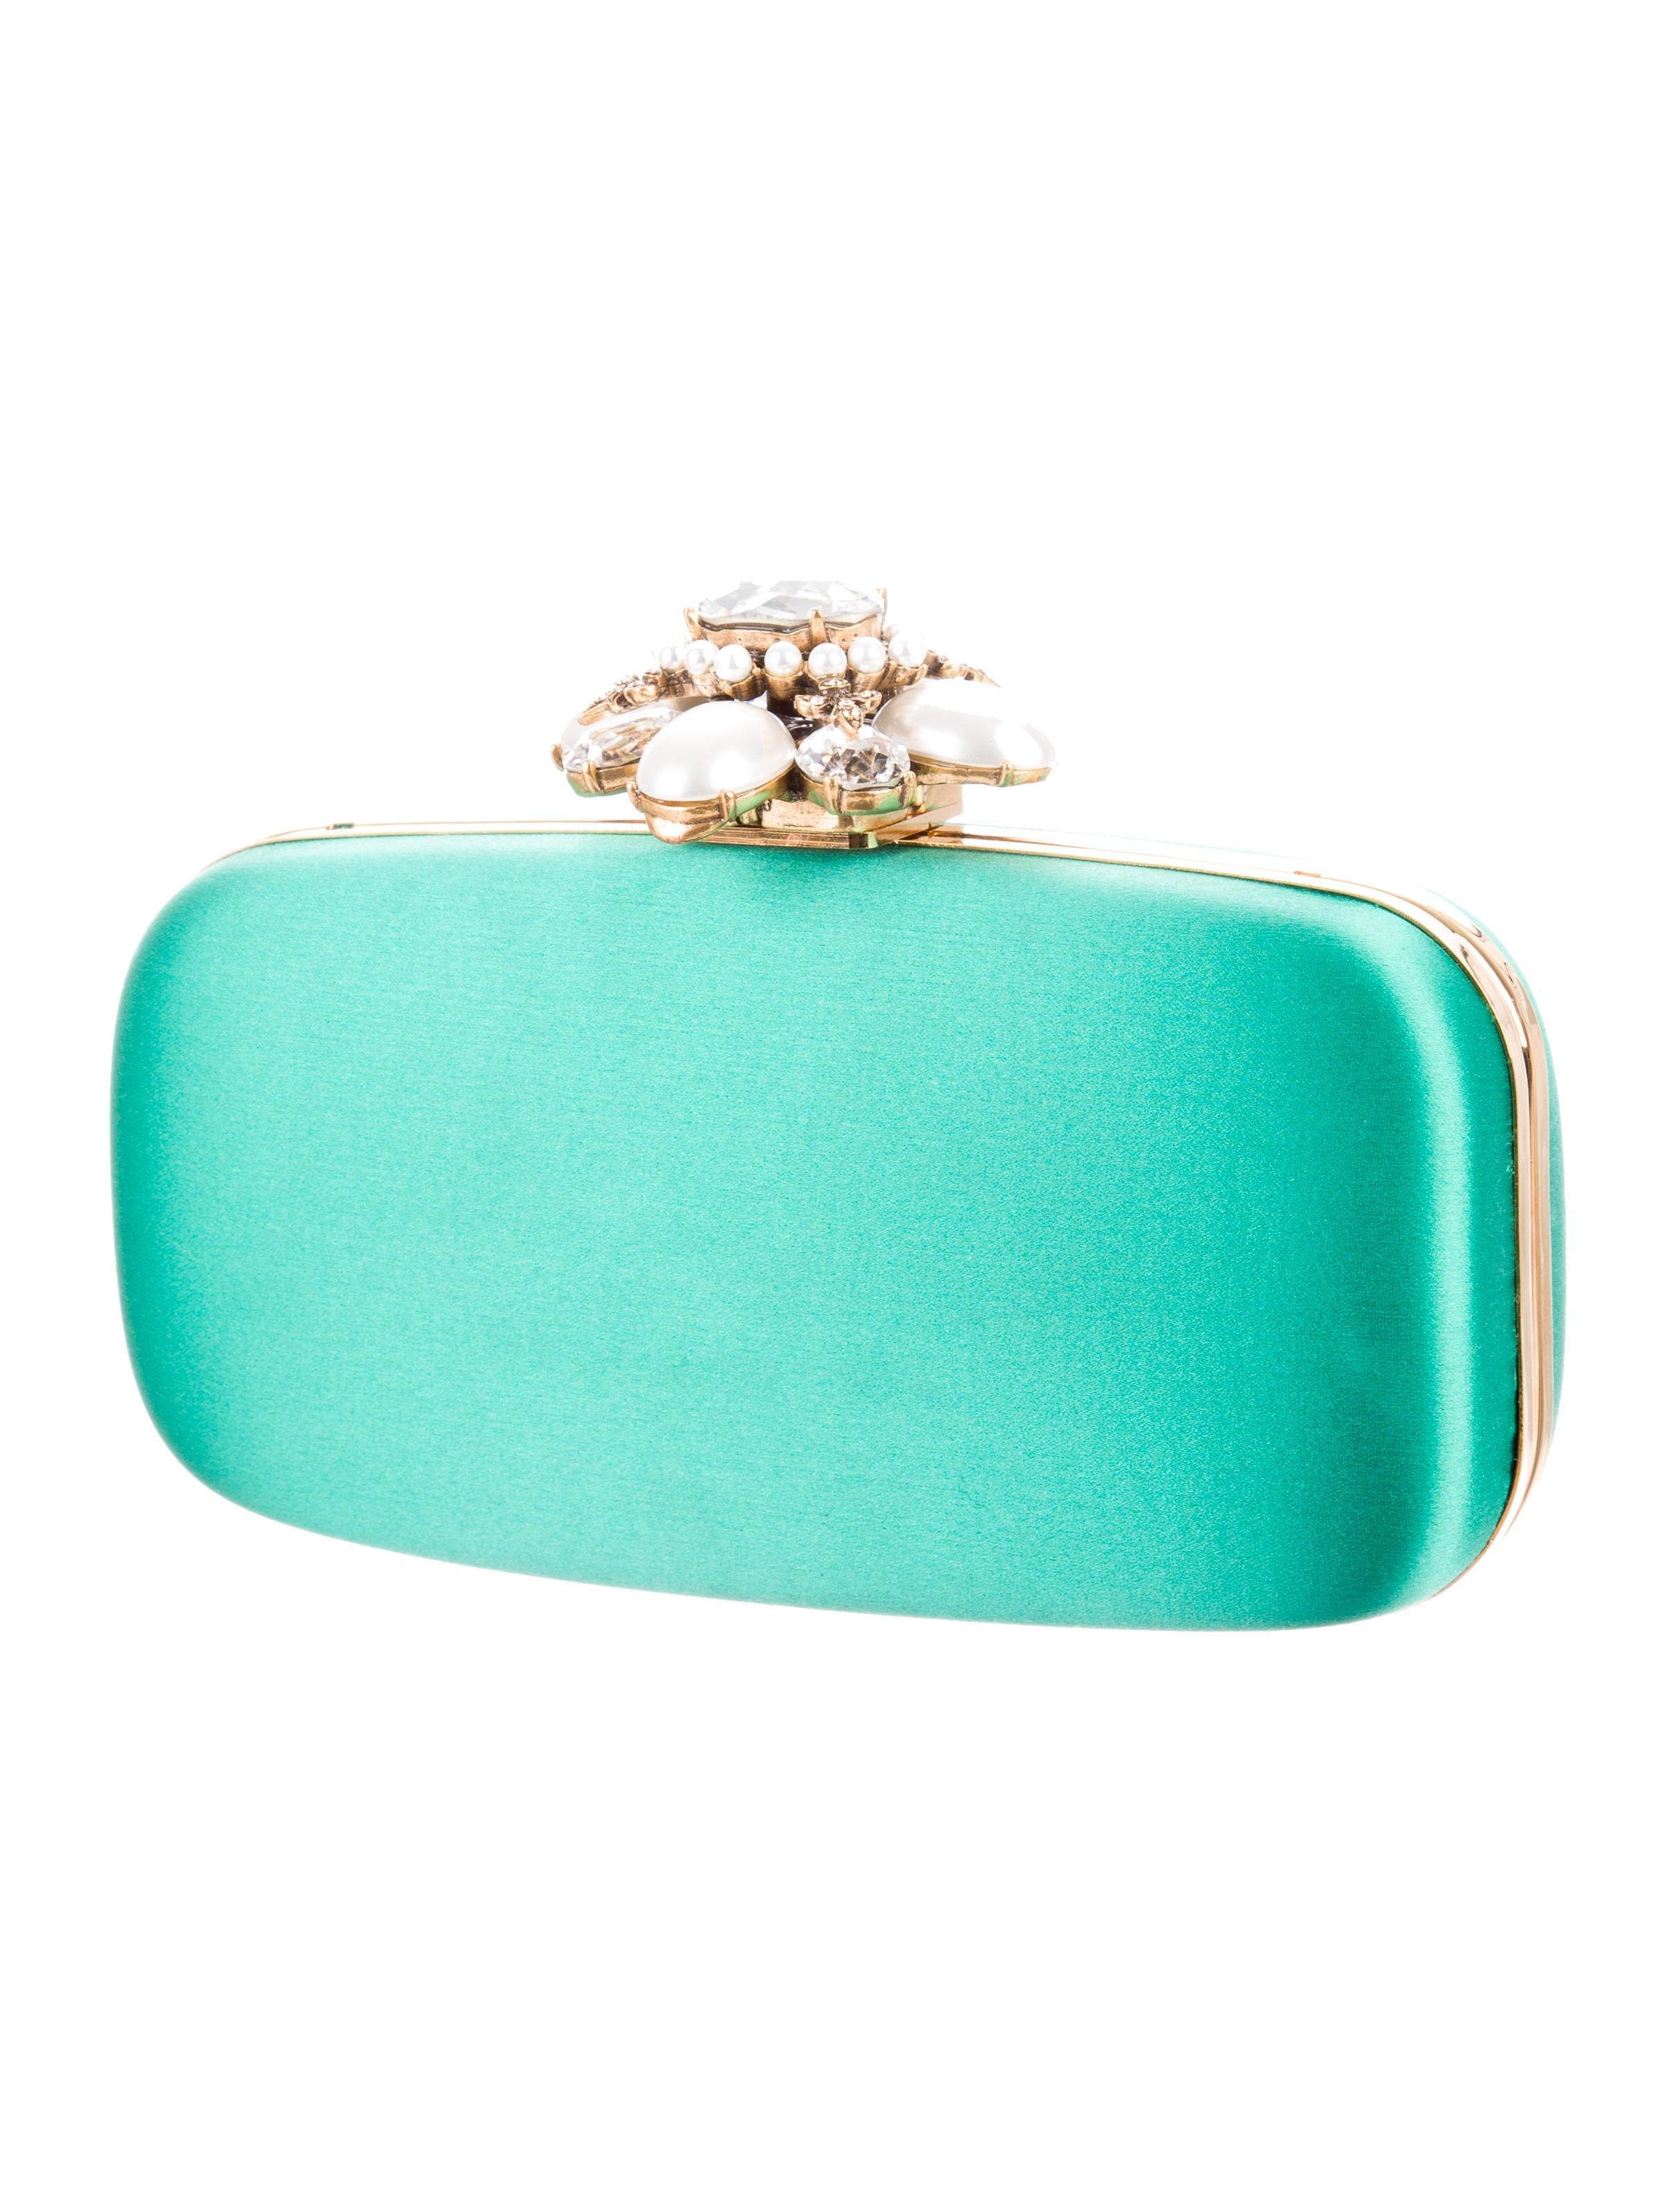 Oscar de la renta embellished satin clutch handbags for Oscar de la renta candles